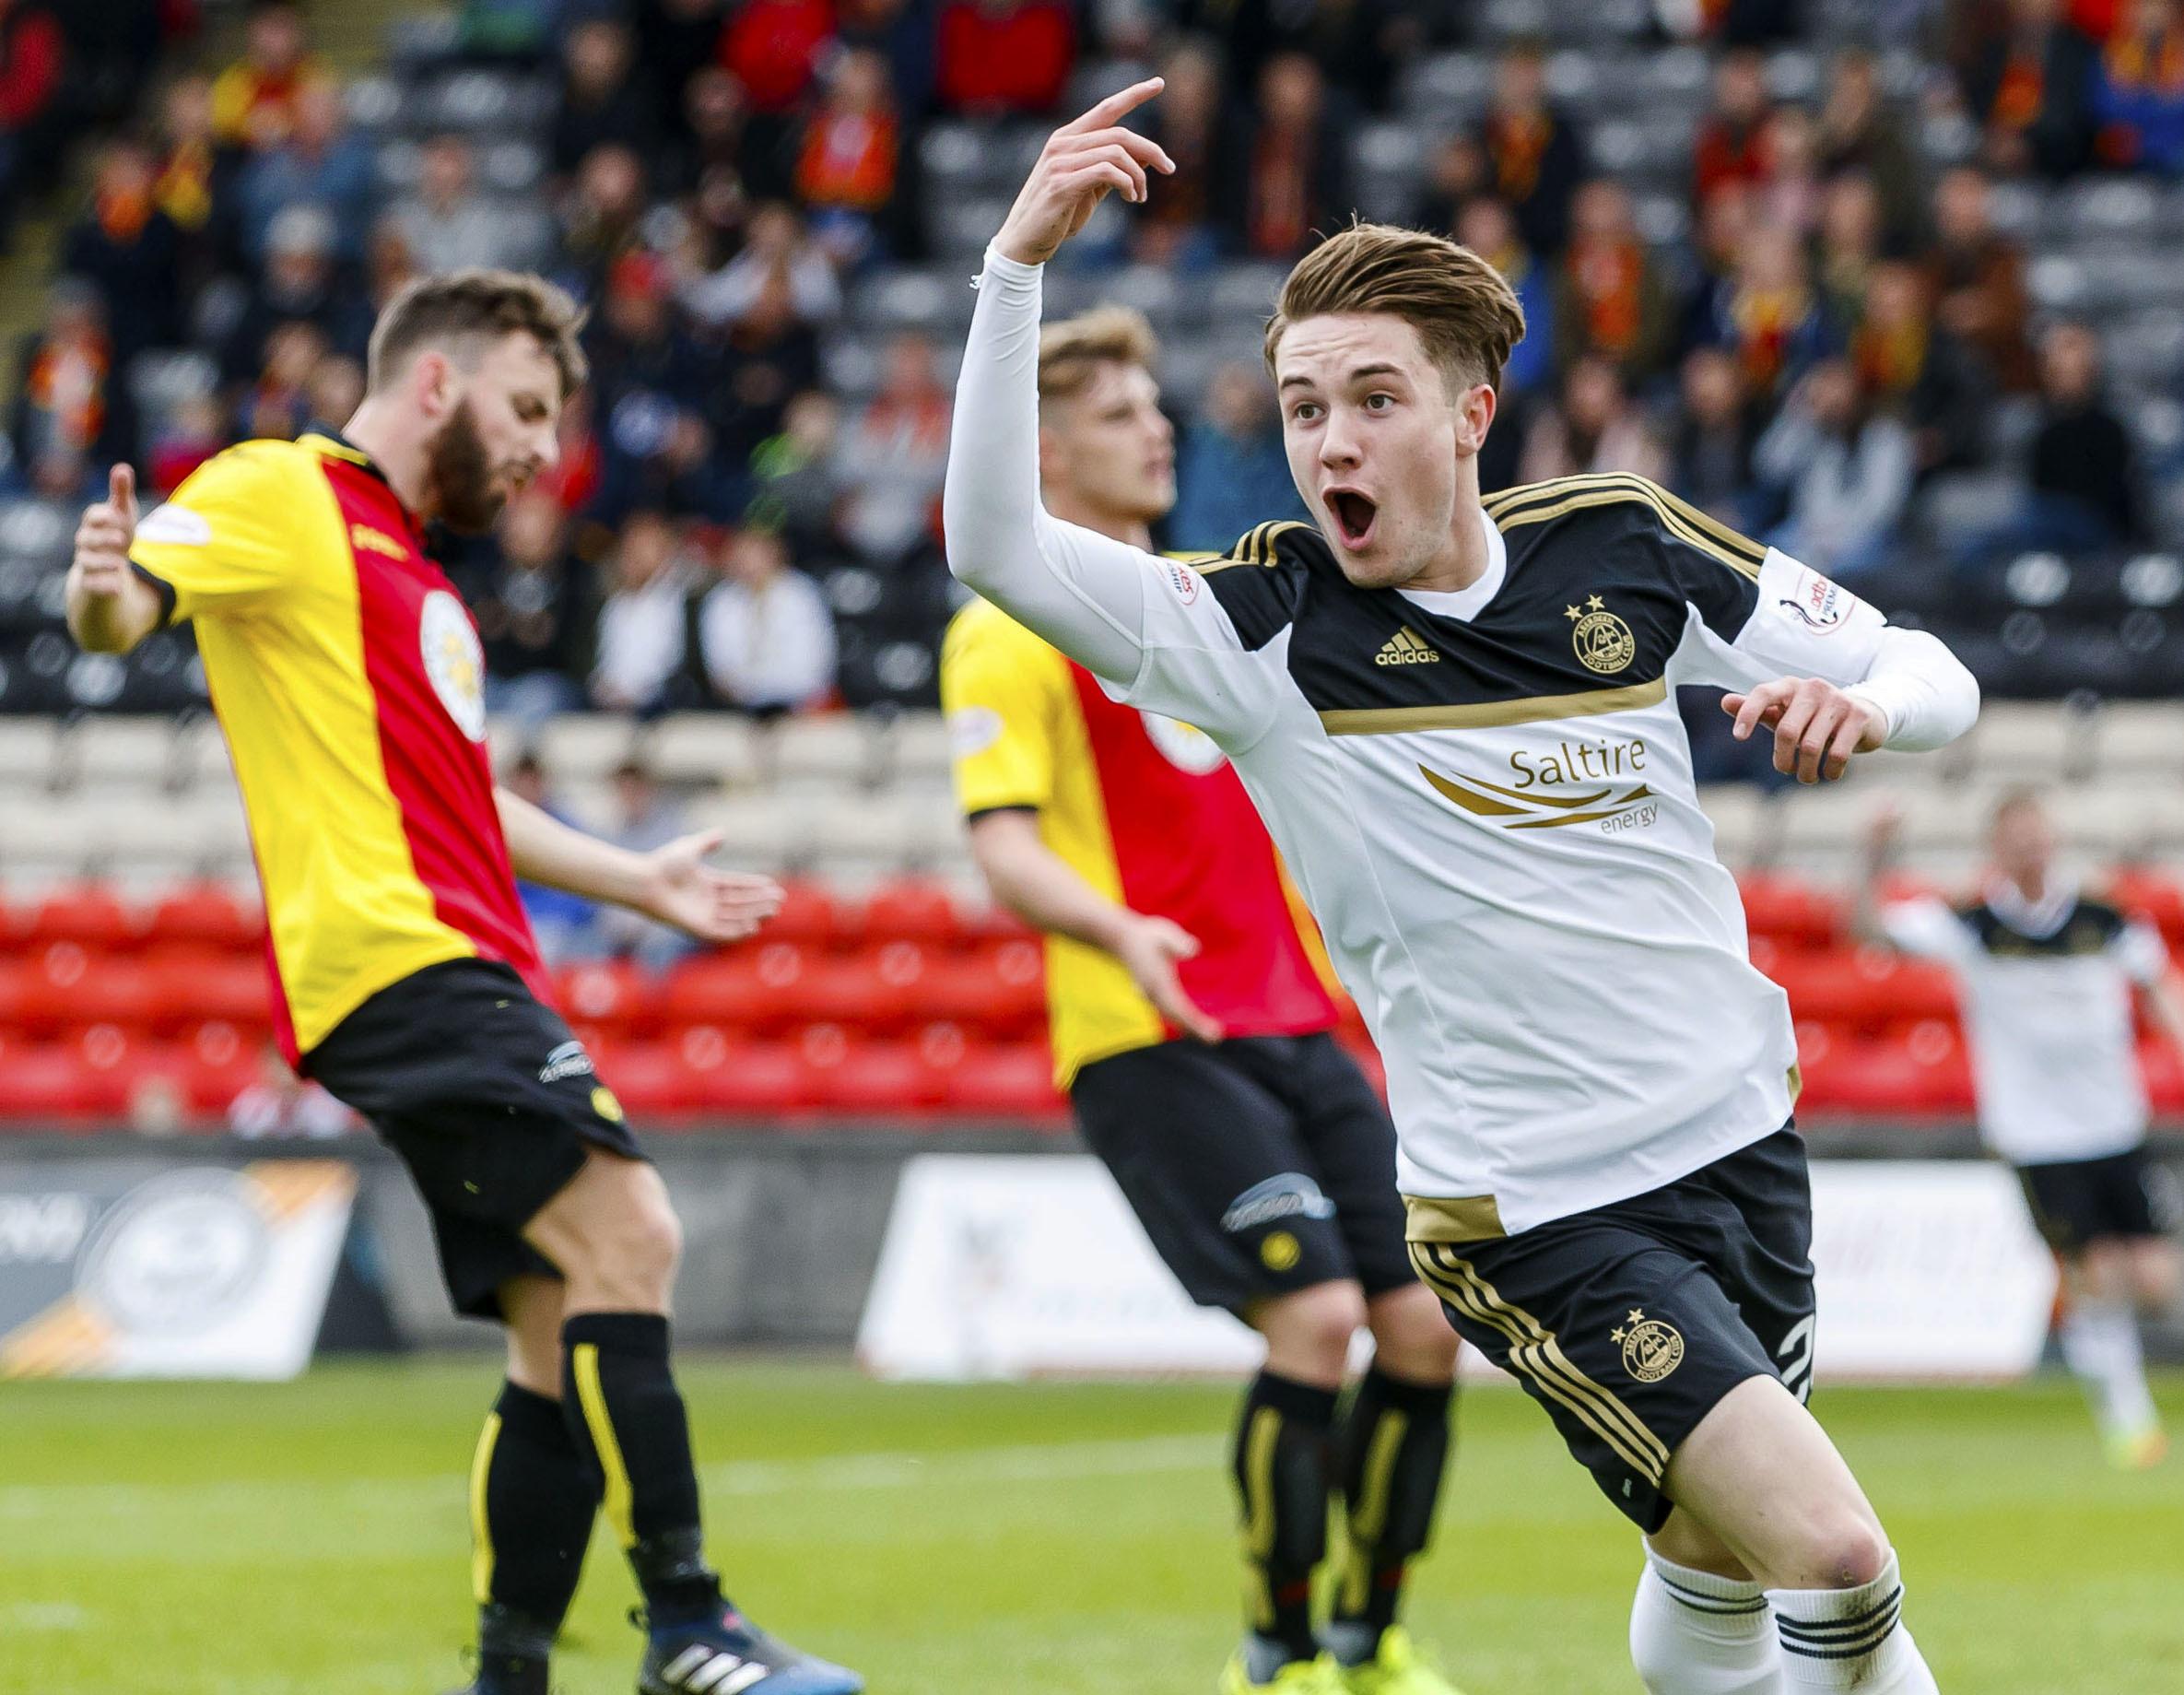 Aberdeen's Scott Wright celebrates his goal